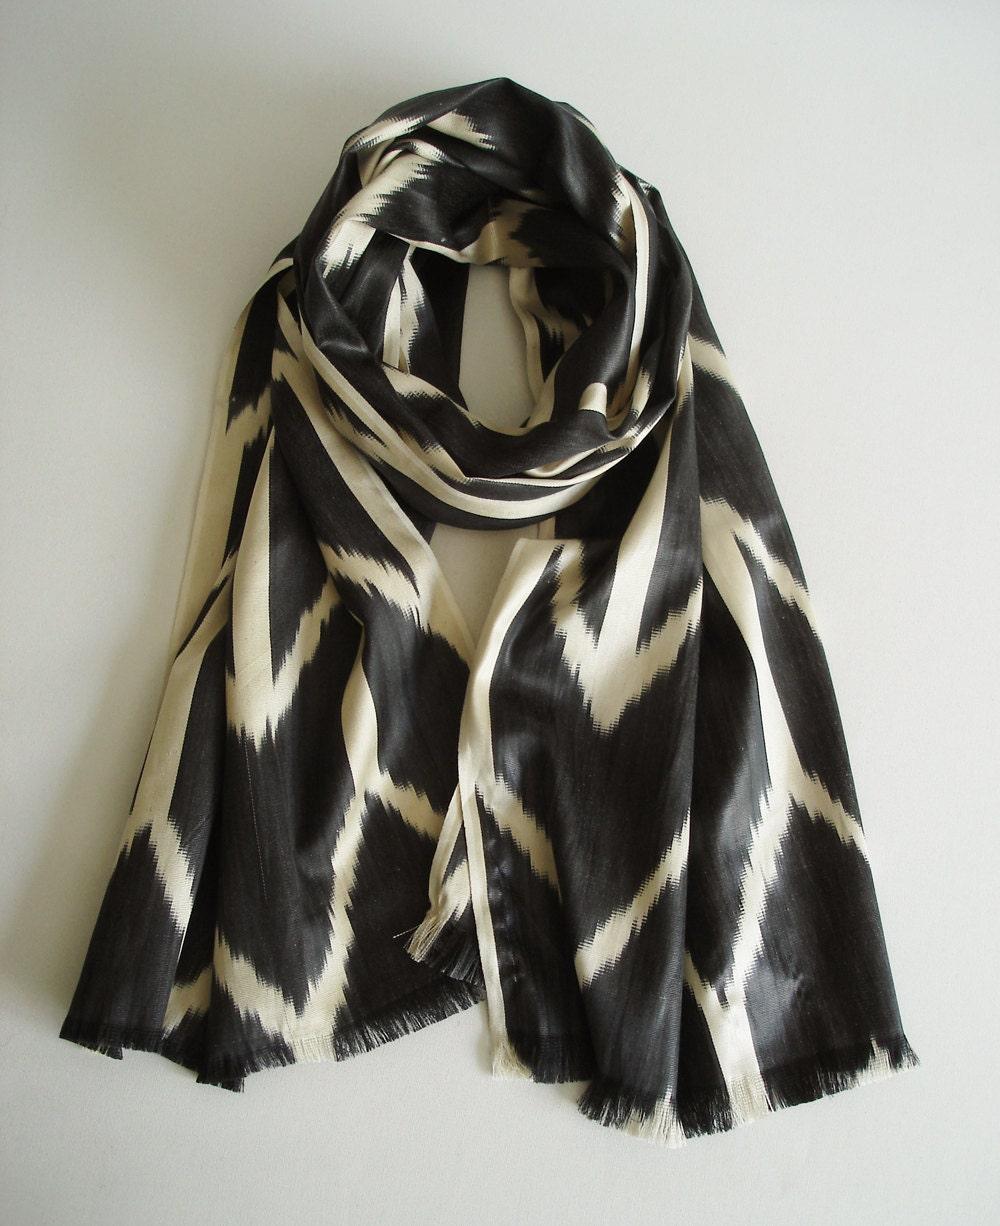 Sukan / Handwoven ikat Silk Scarf, Modern, Bohemian, Gray, Dark Gray, Beige Color